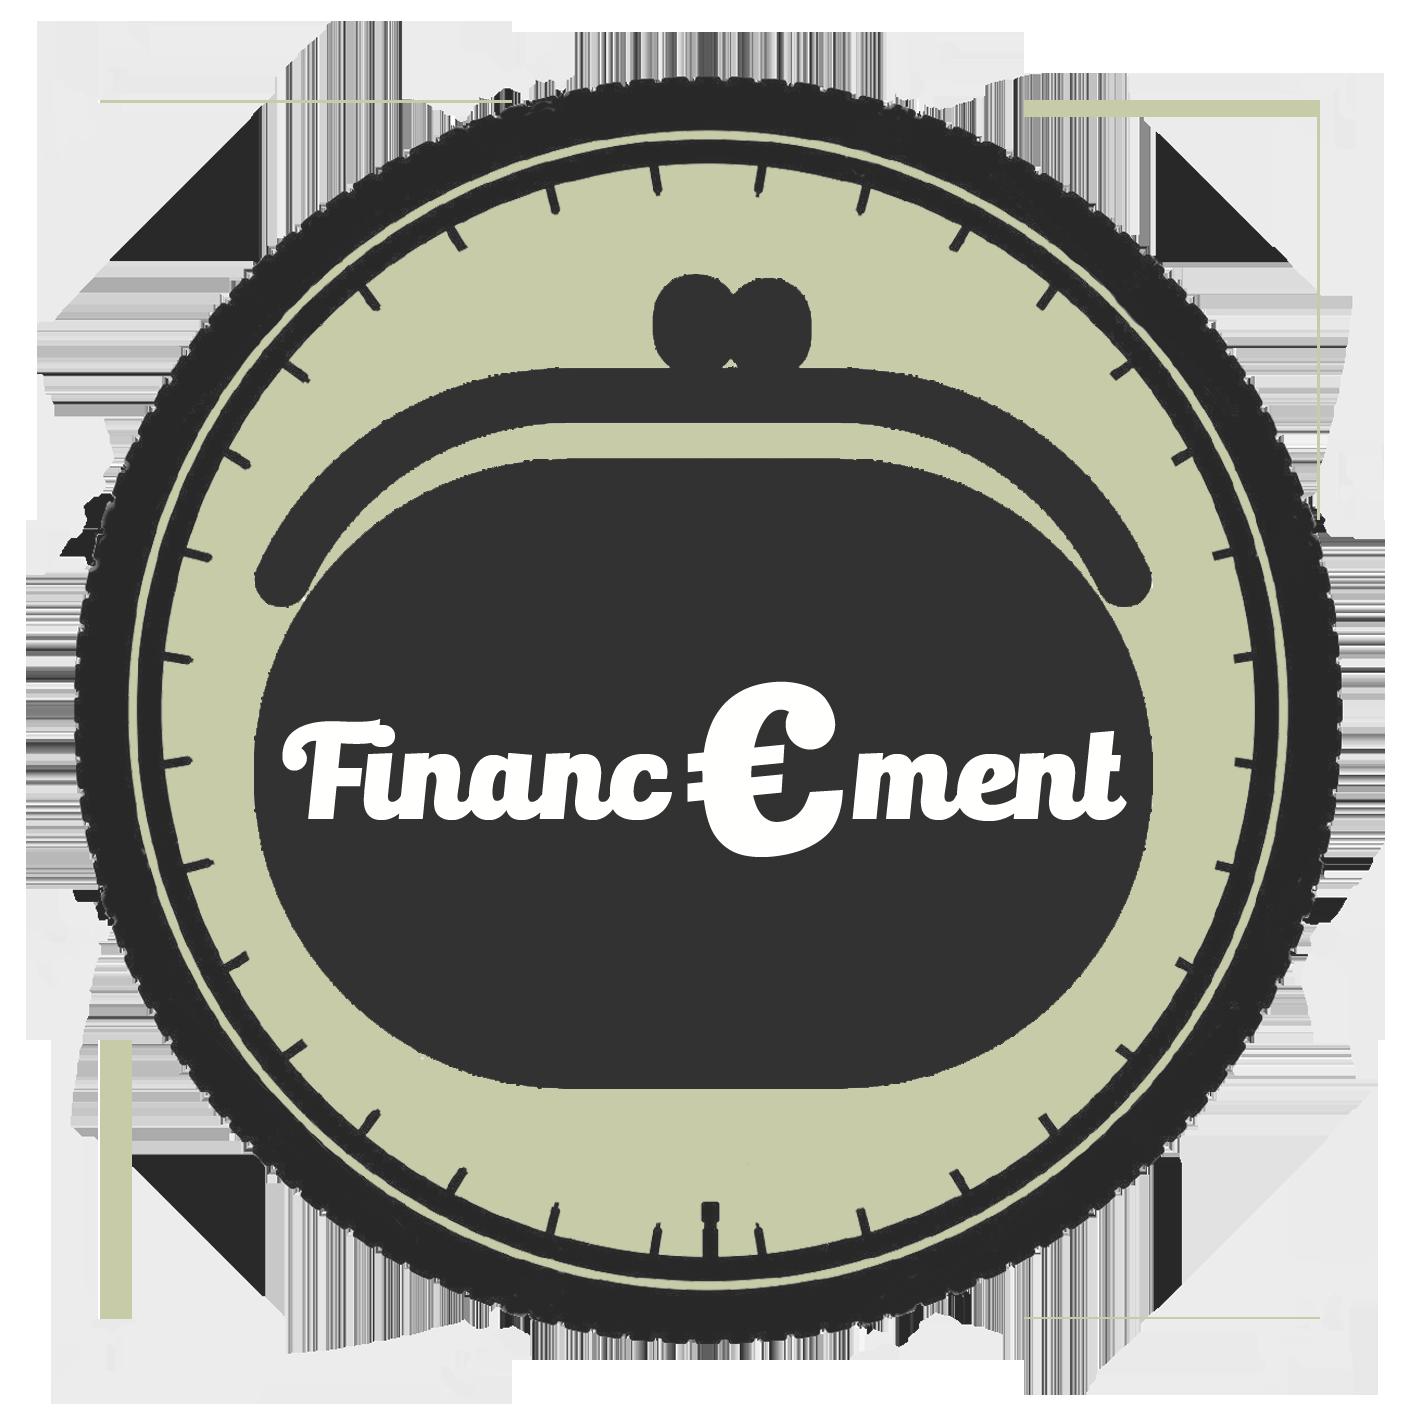 Picto Financement copie.png